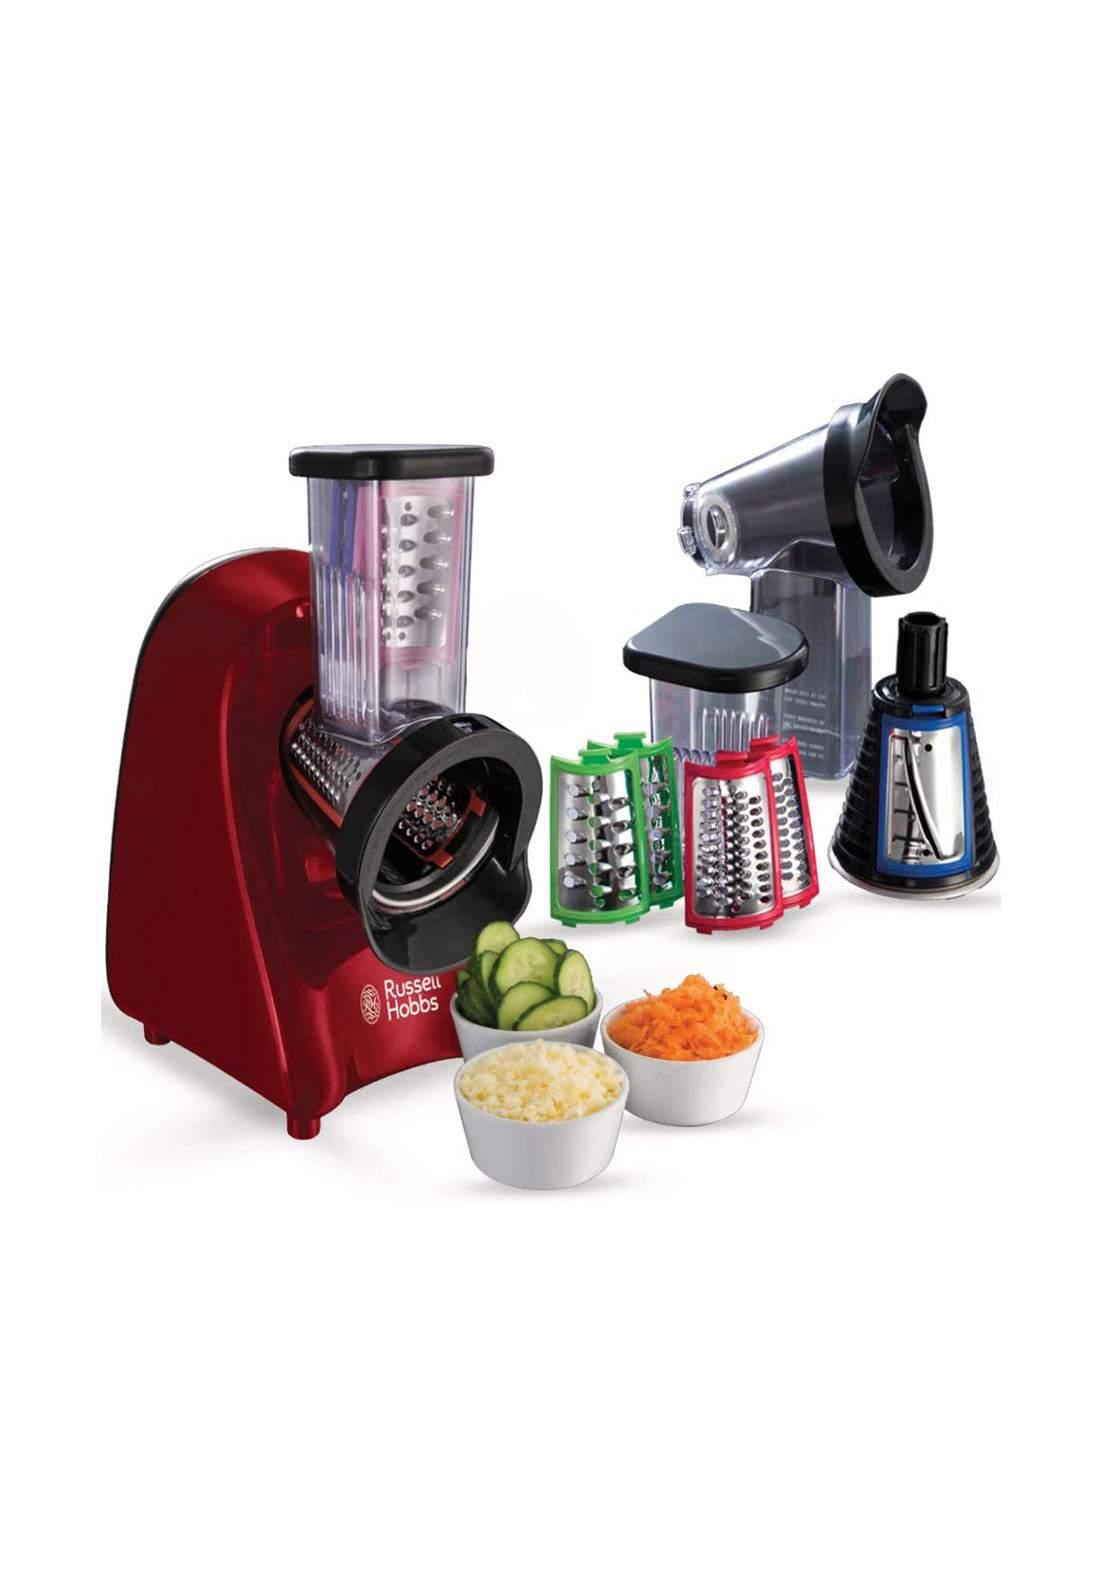 Russell hobbs 22280 Desire Food Slicer, Shredder & Grater أداة كهربائية للتقطيع وصنع الآيس كريم